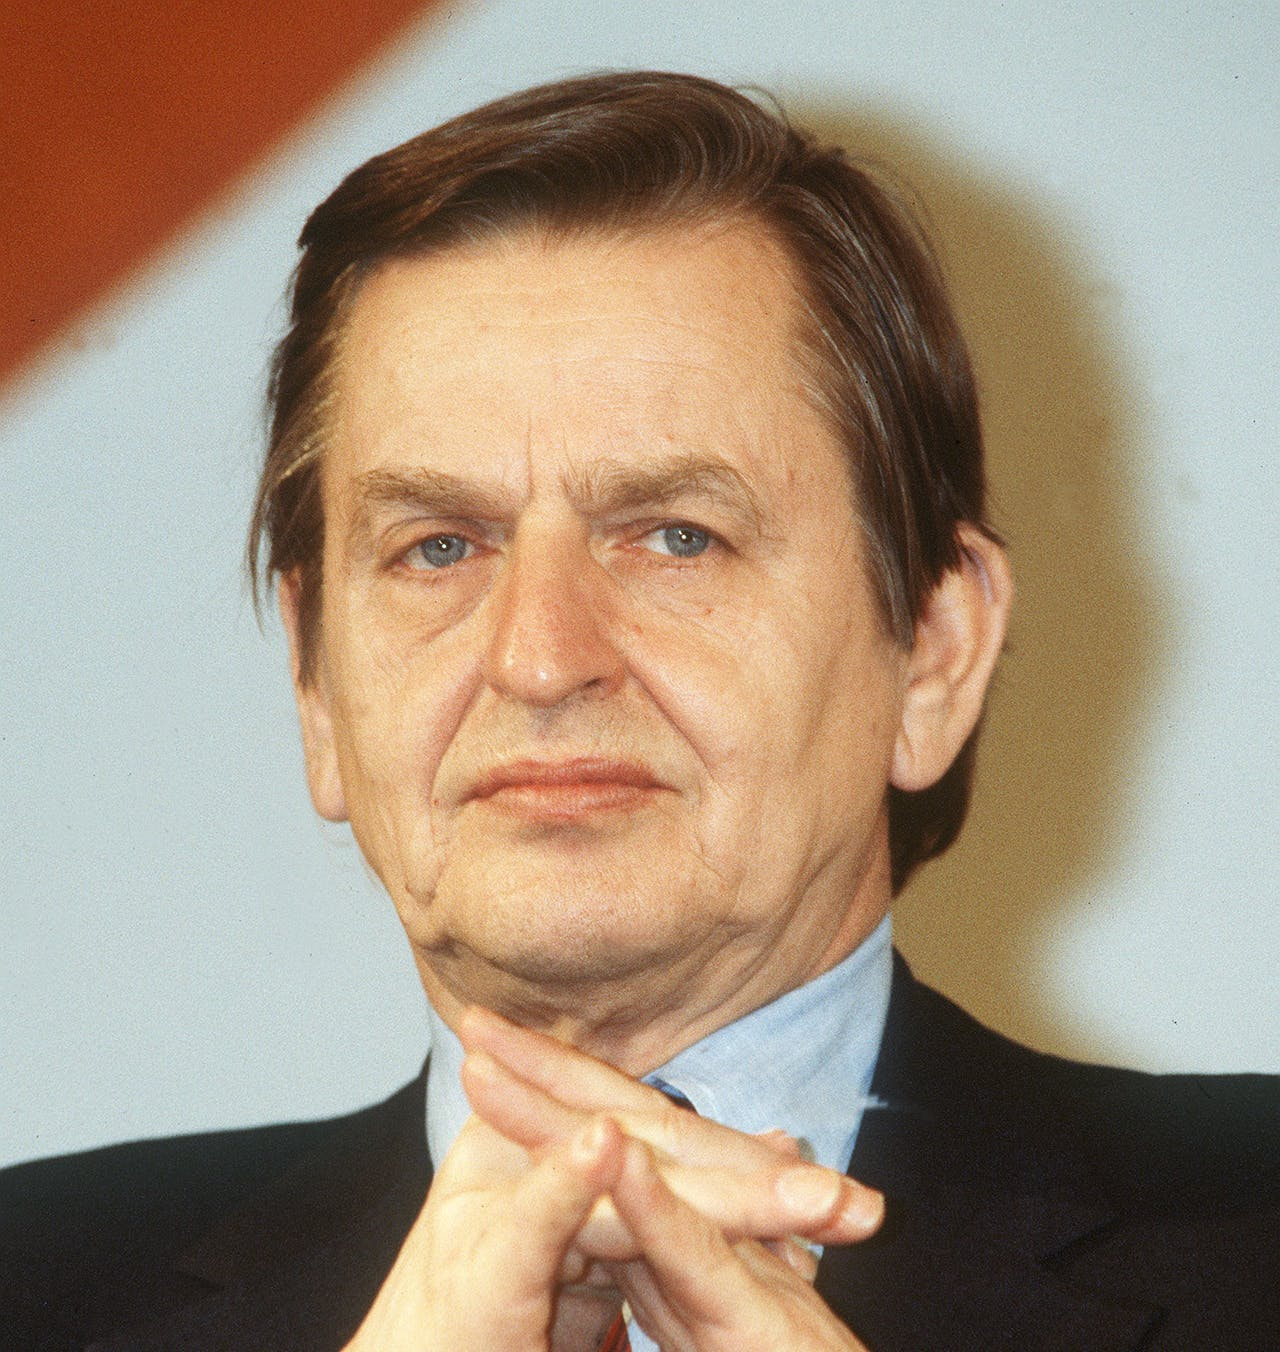 De in 1986 vermoorde Zweedse minister-president Olof Palme